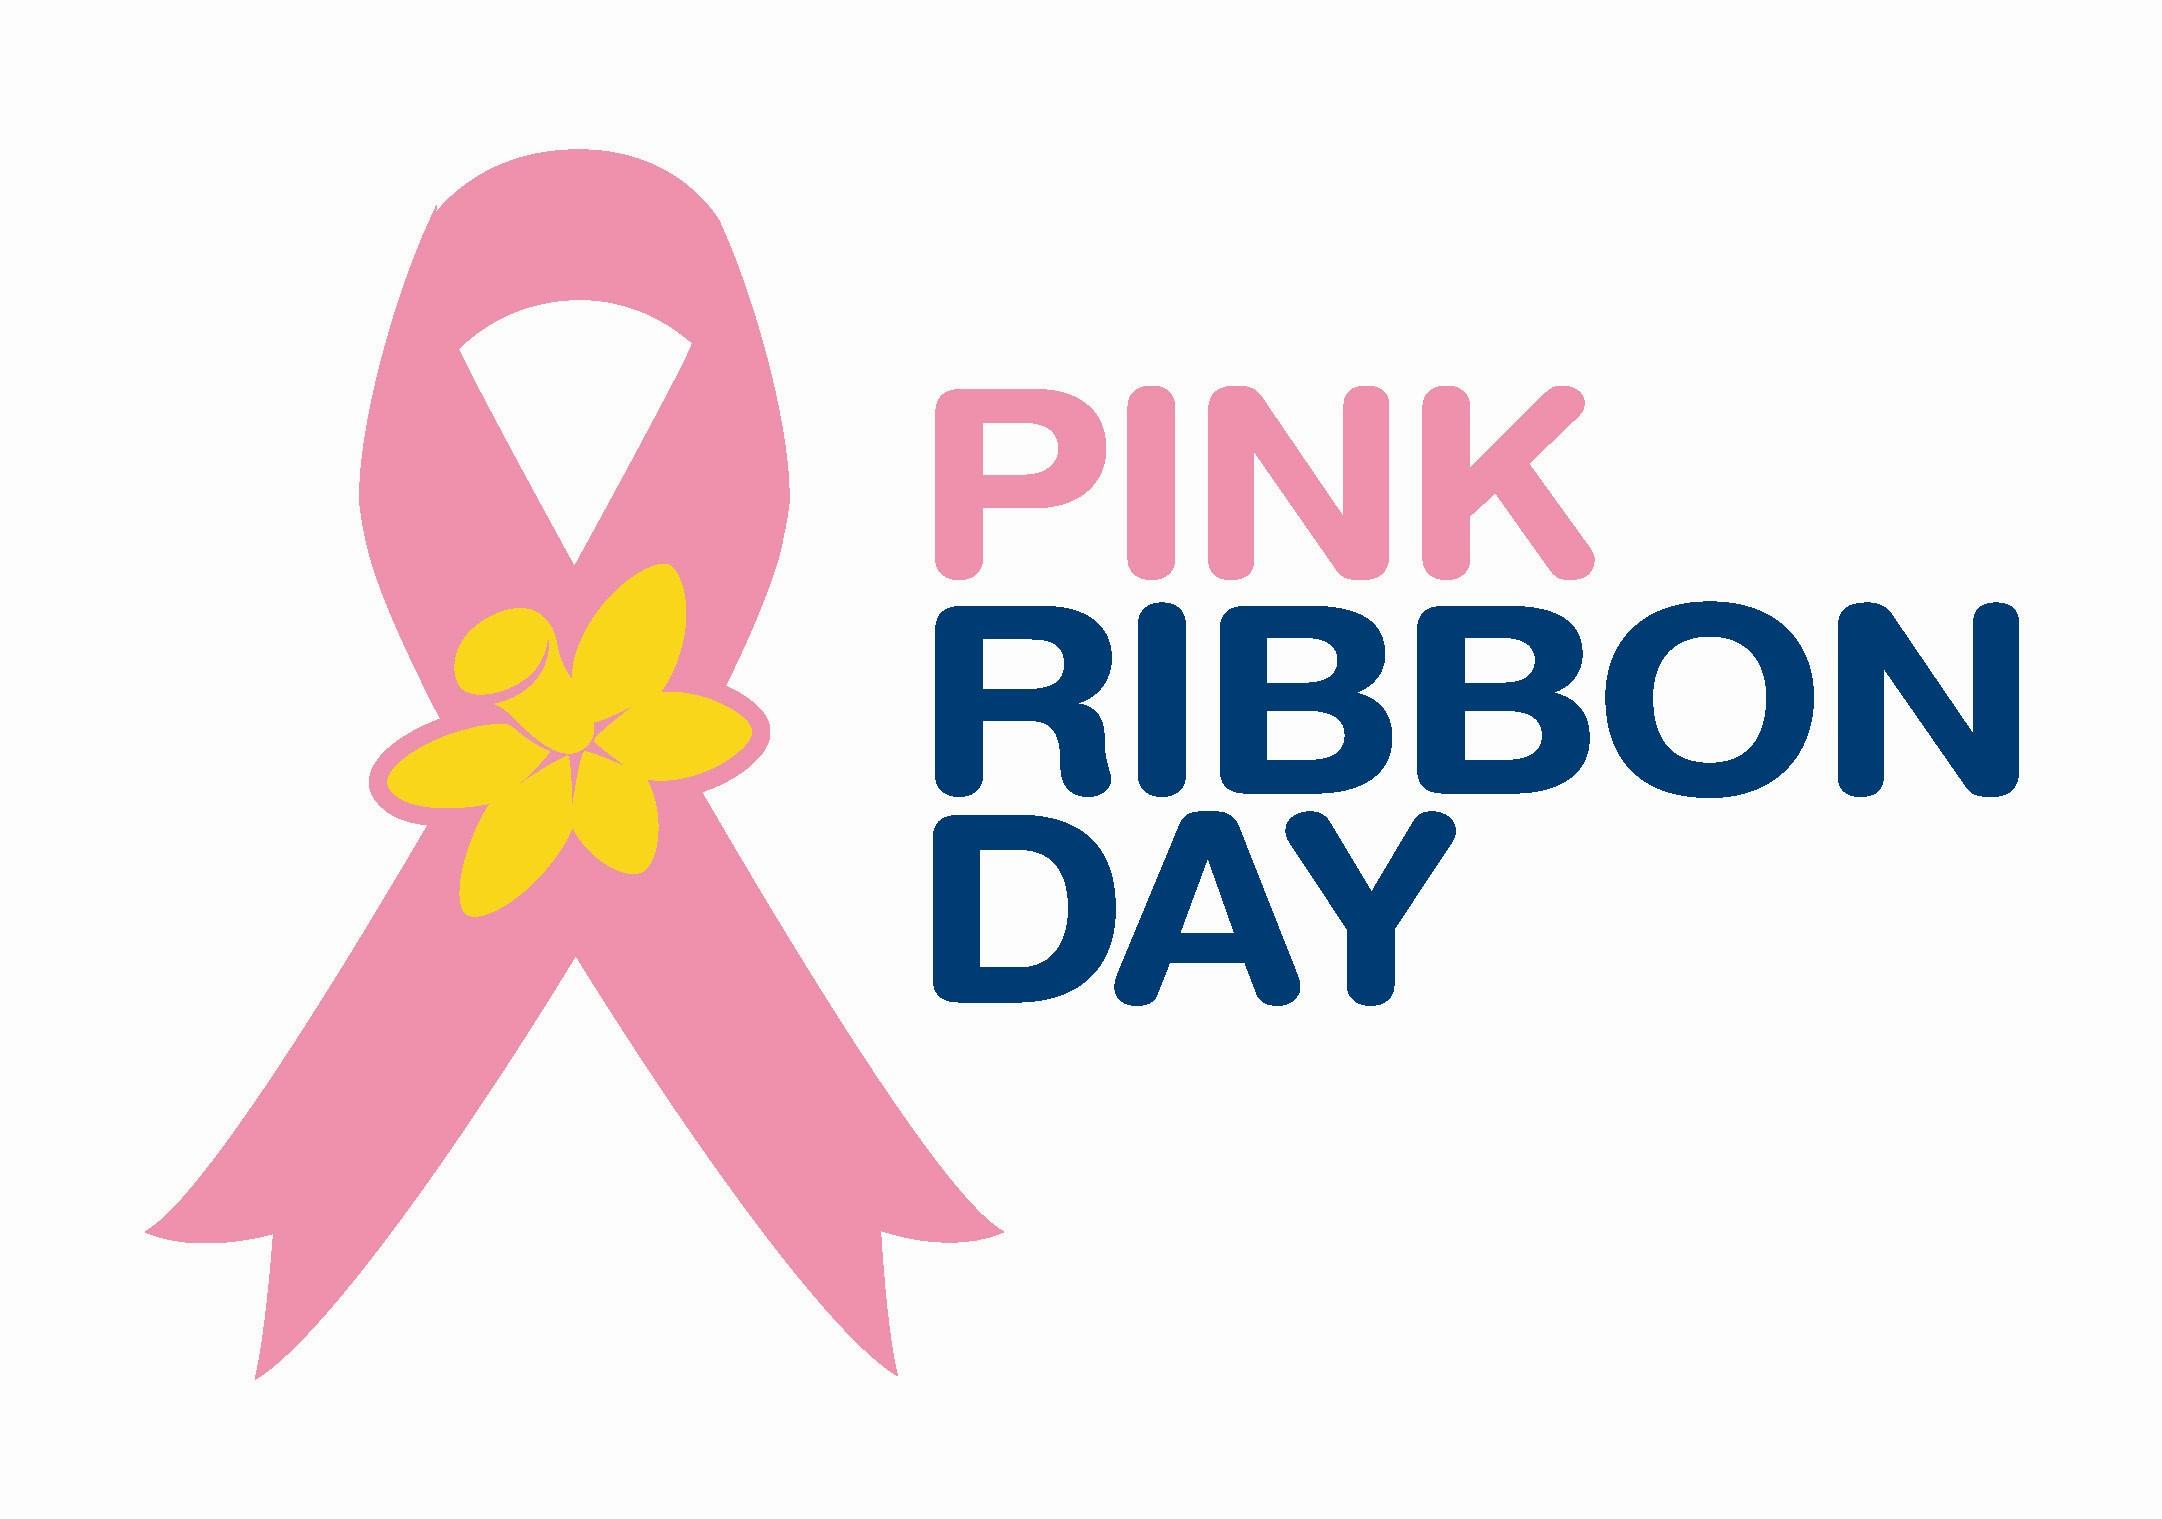 Pink Ribbon Day